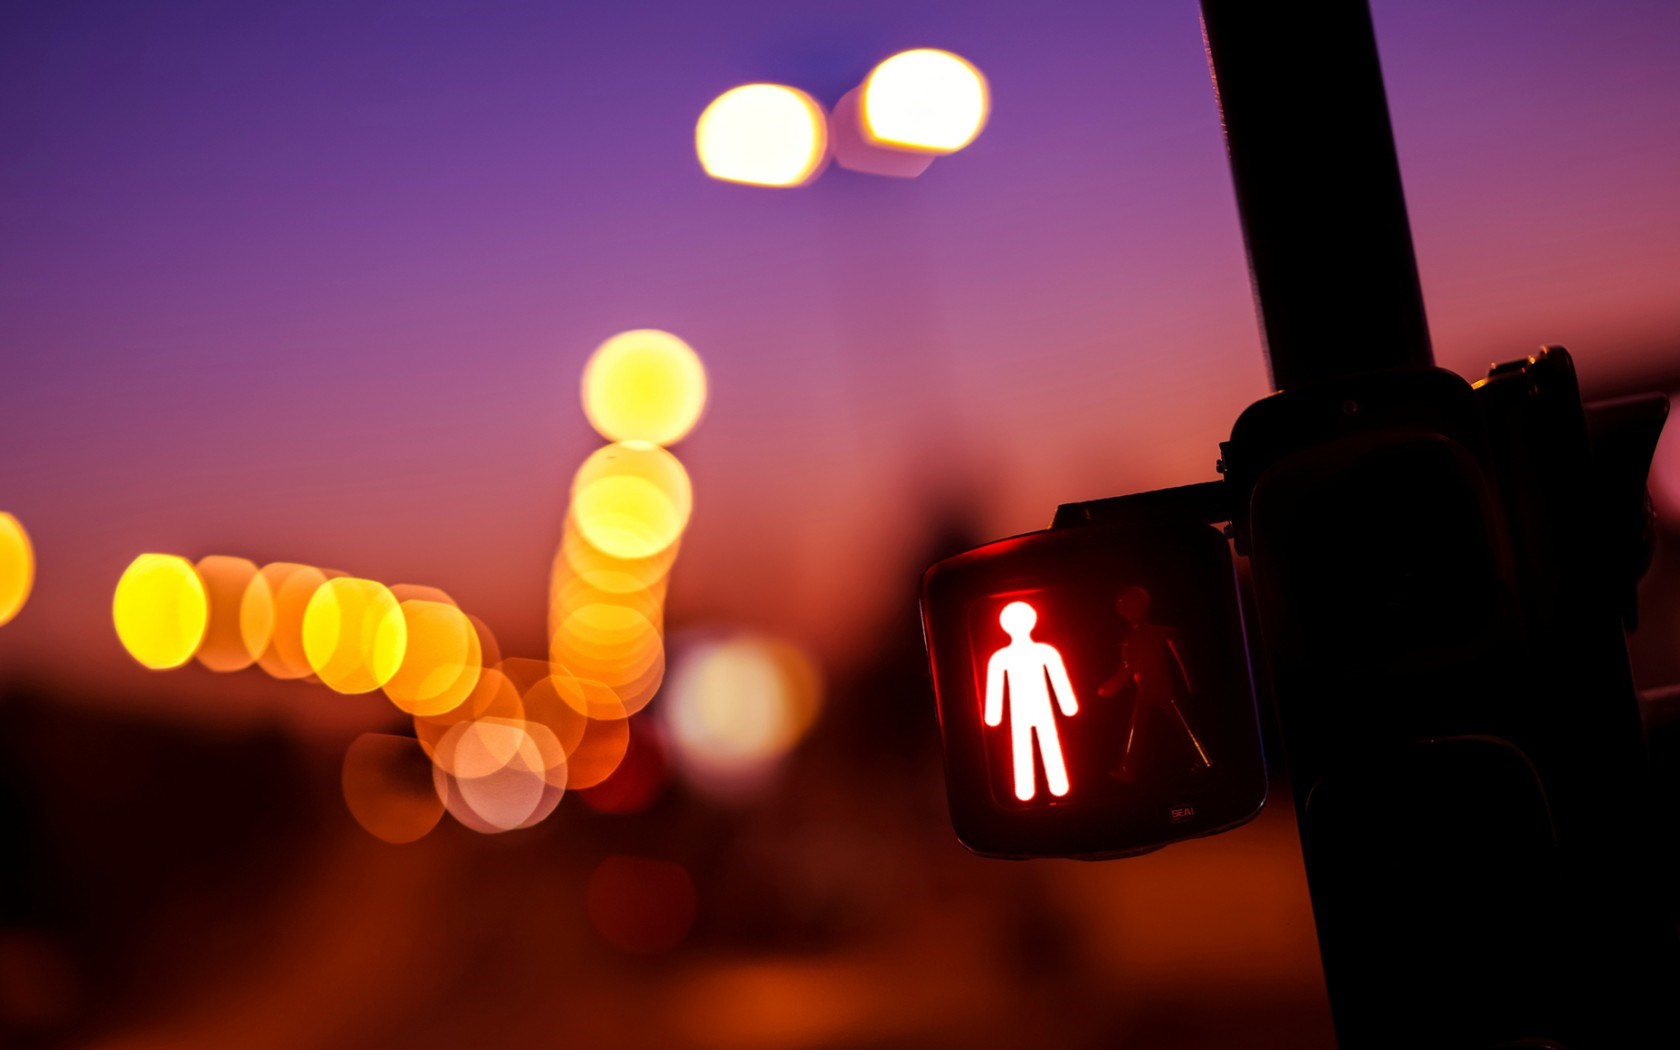 Traffic Light 35194 1680x1050 px ~ HDWallSource.com for Real Traffic Light Night  166kxo